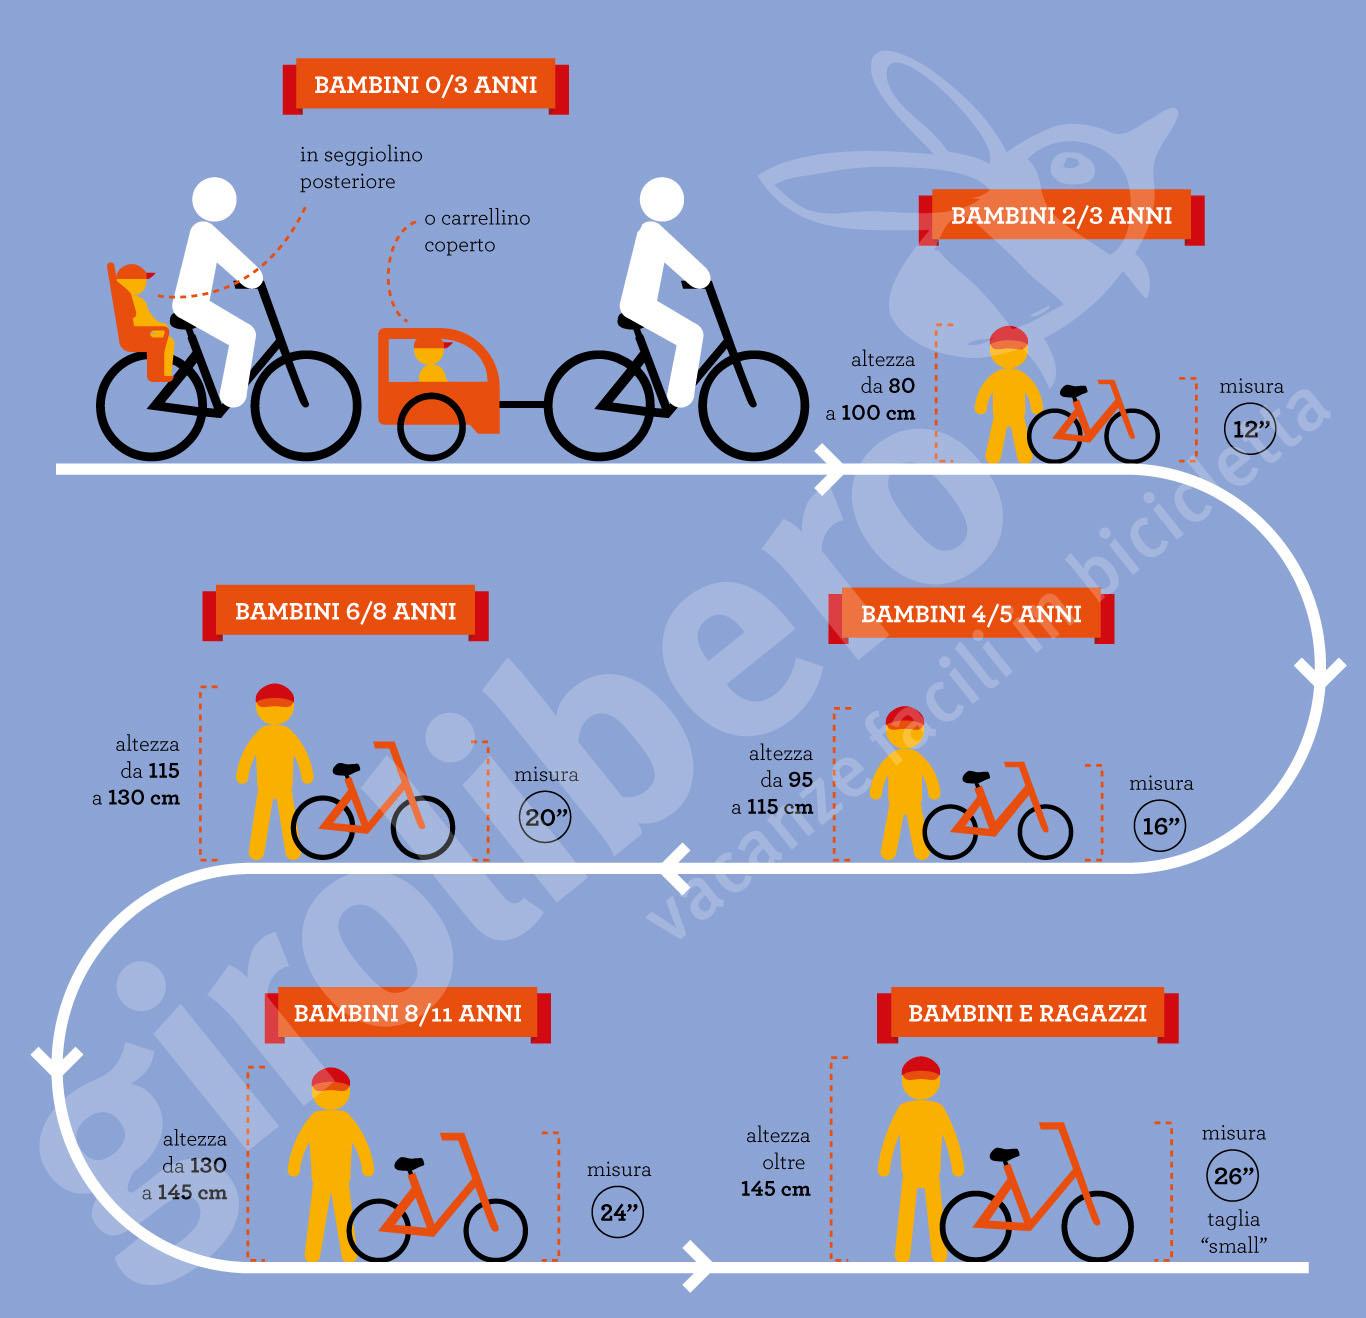 Bicicletta X Bimbo Di 3 Anni